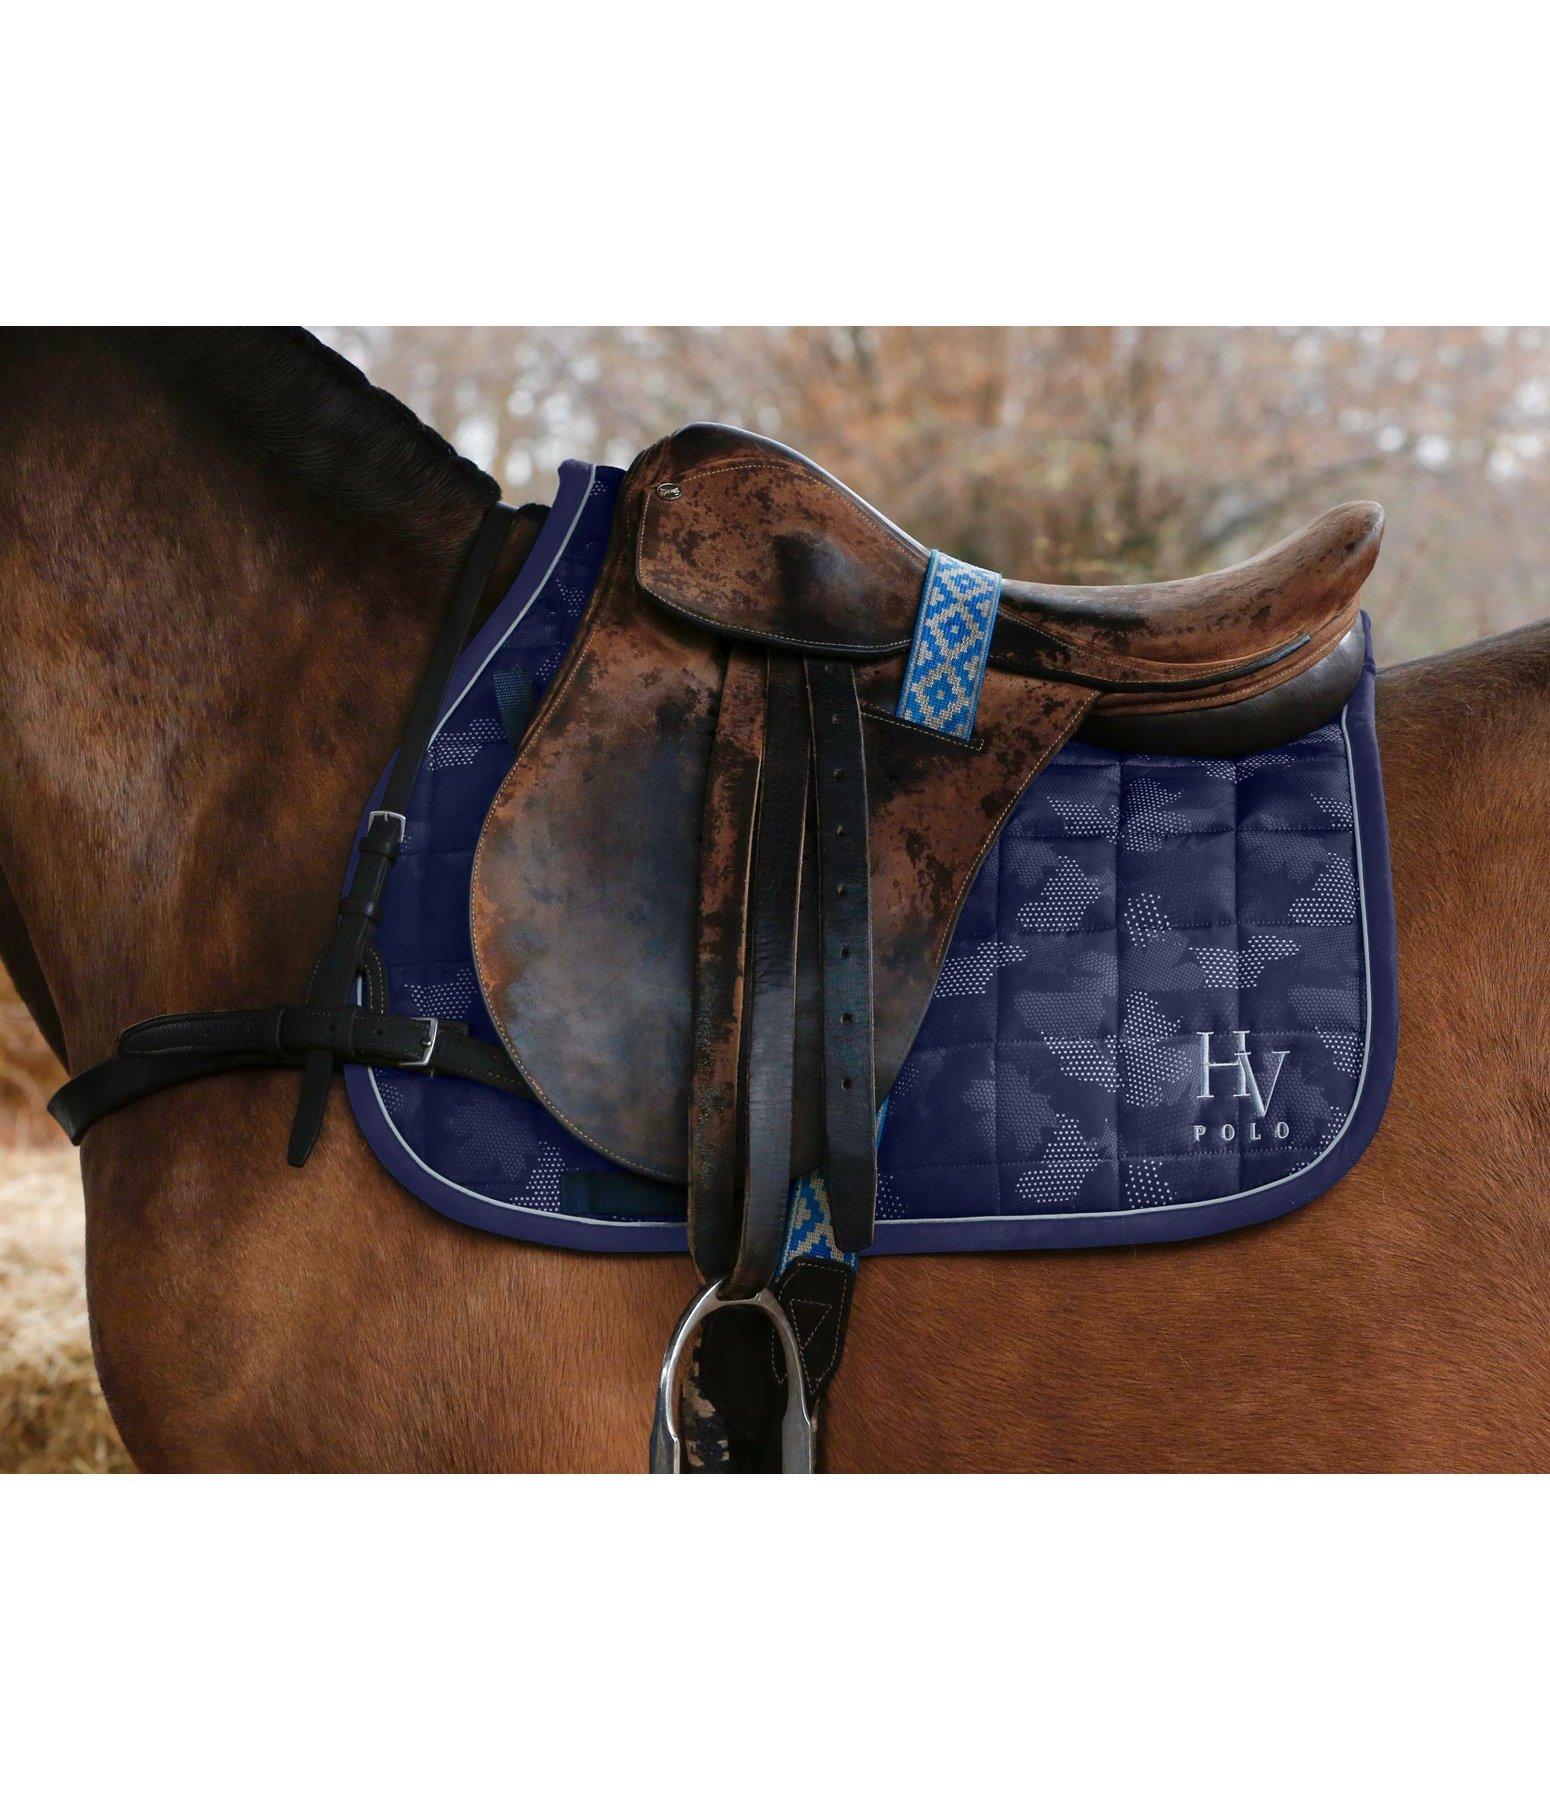 31f1d652f6 Saddle Pad Macy - HV POLO - Kramer Equestrian